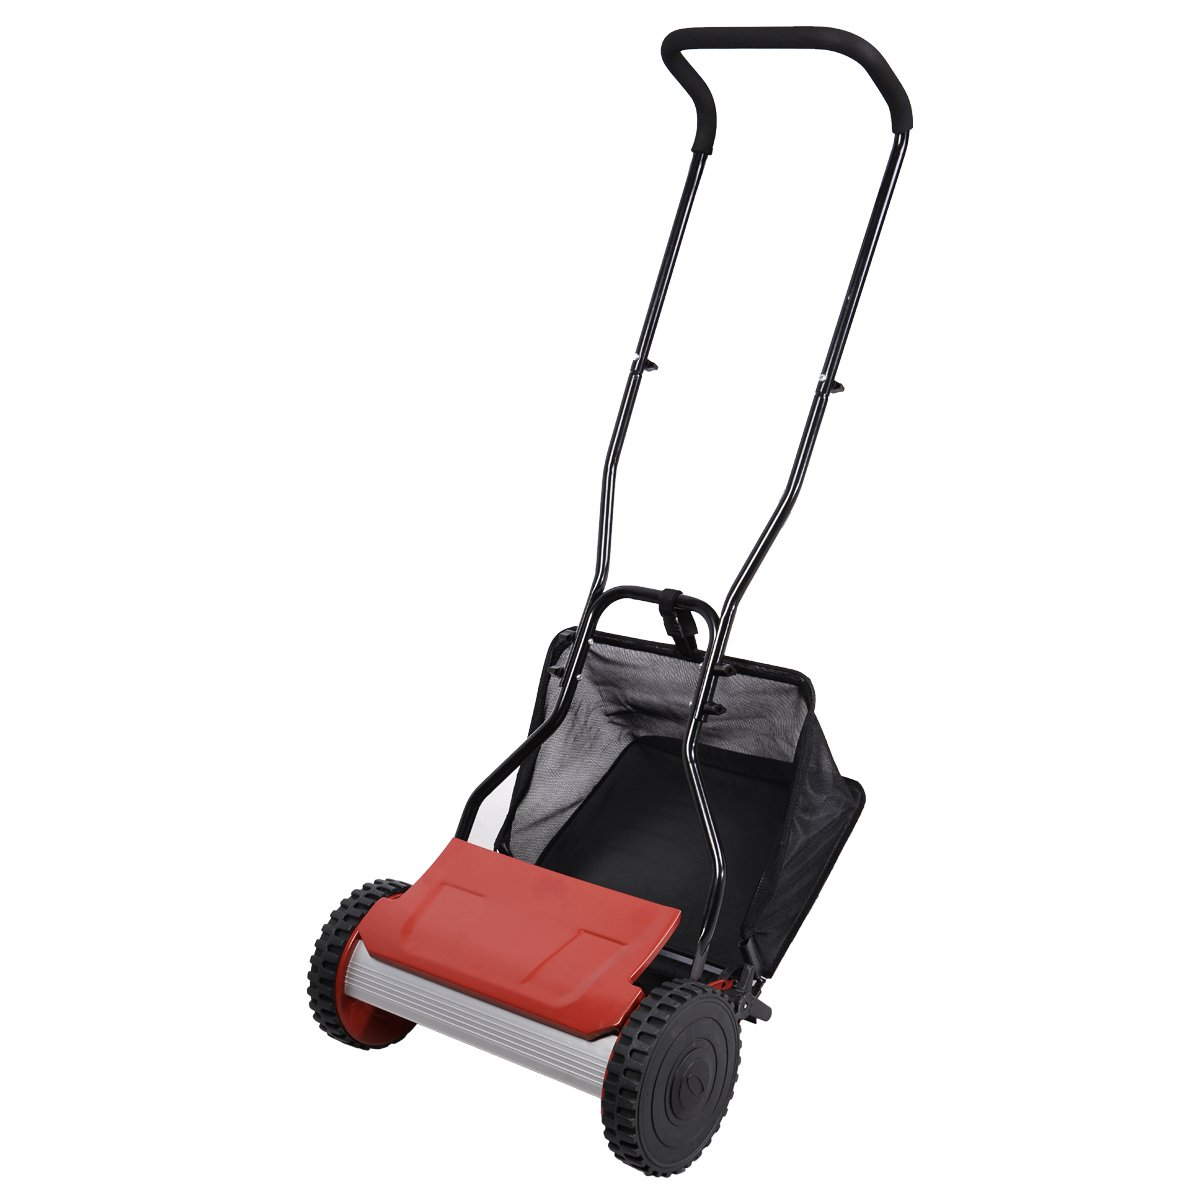 FDS Manual Lawn Mower Garden Hand Push Grass Cutting Cylinder 38cm Cutting  Width